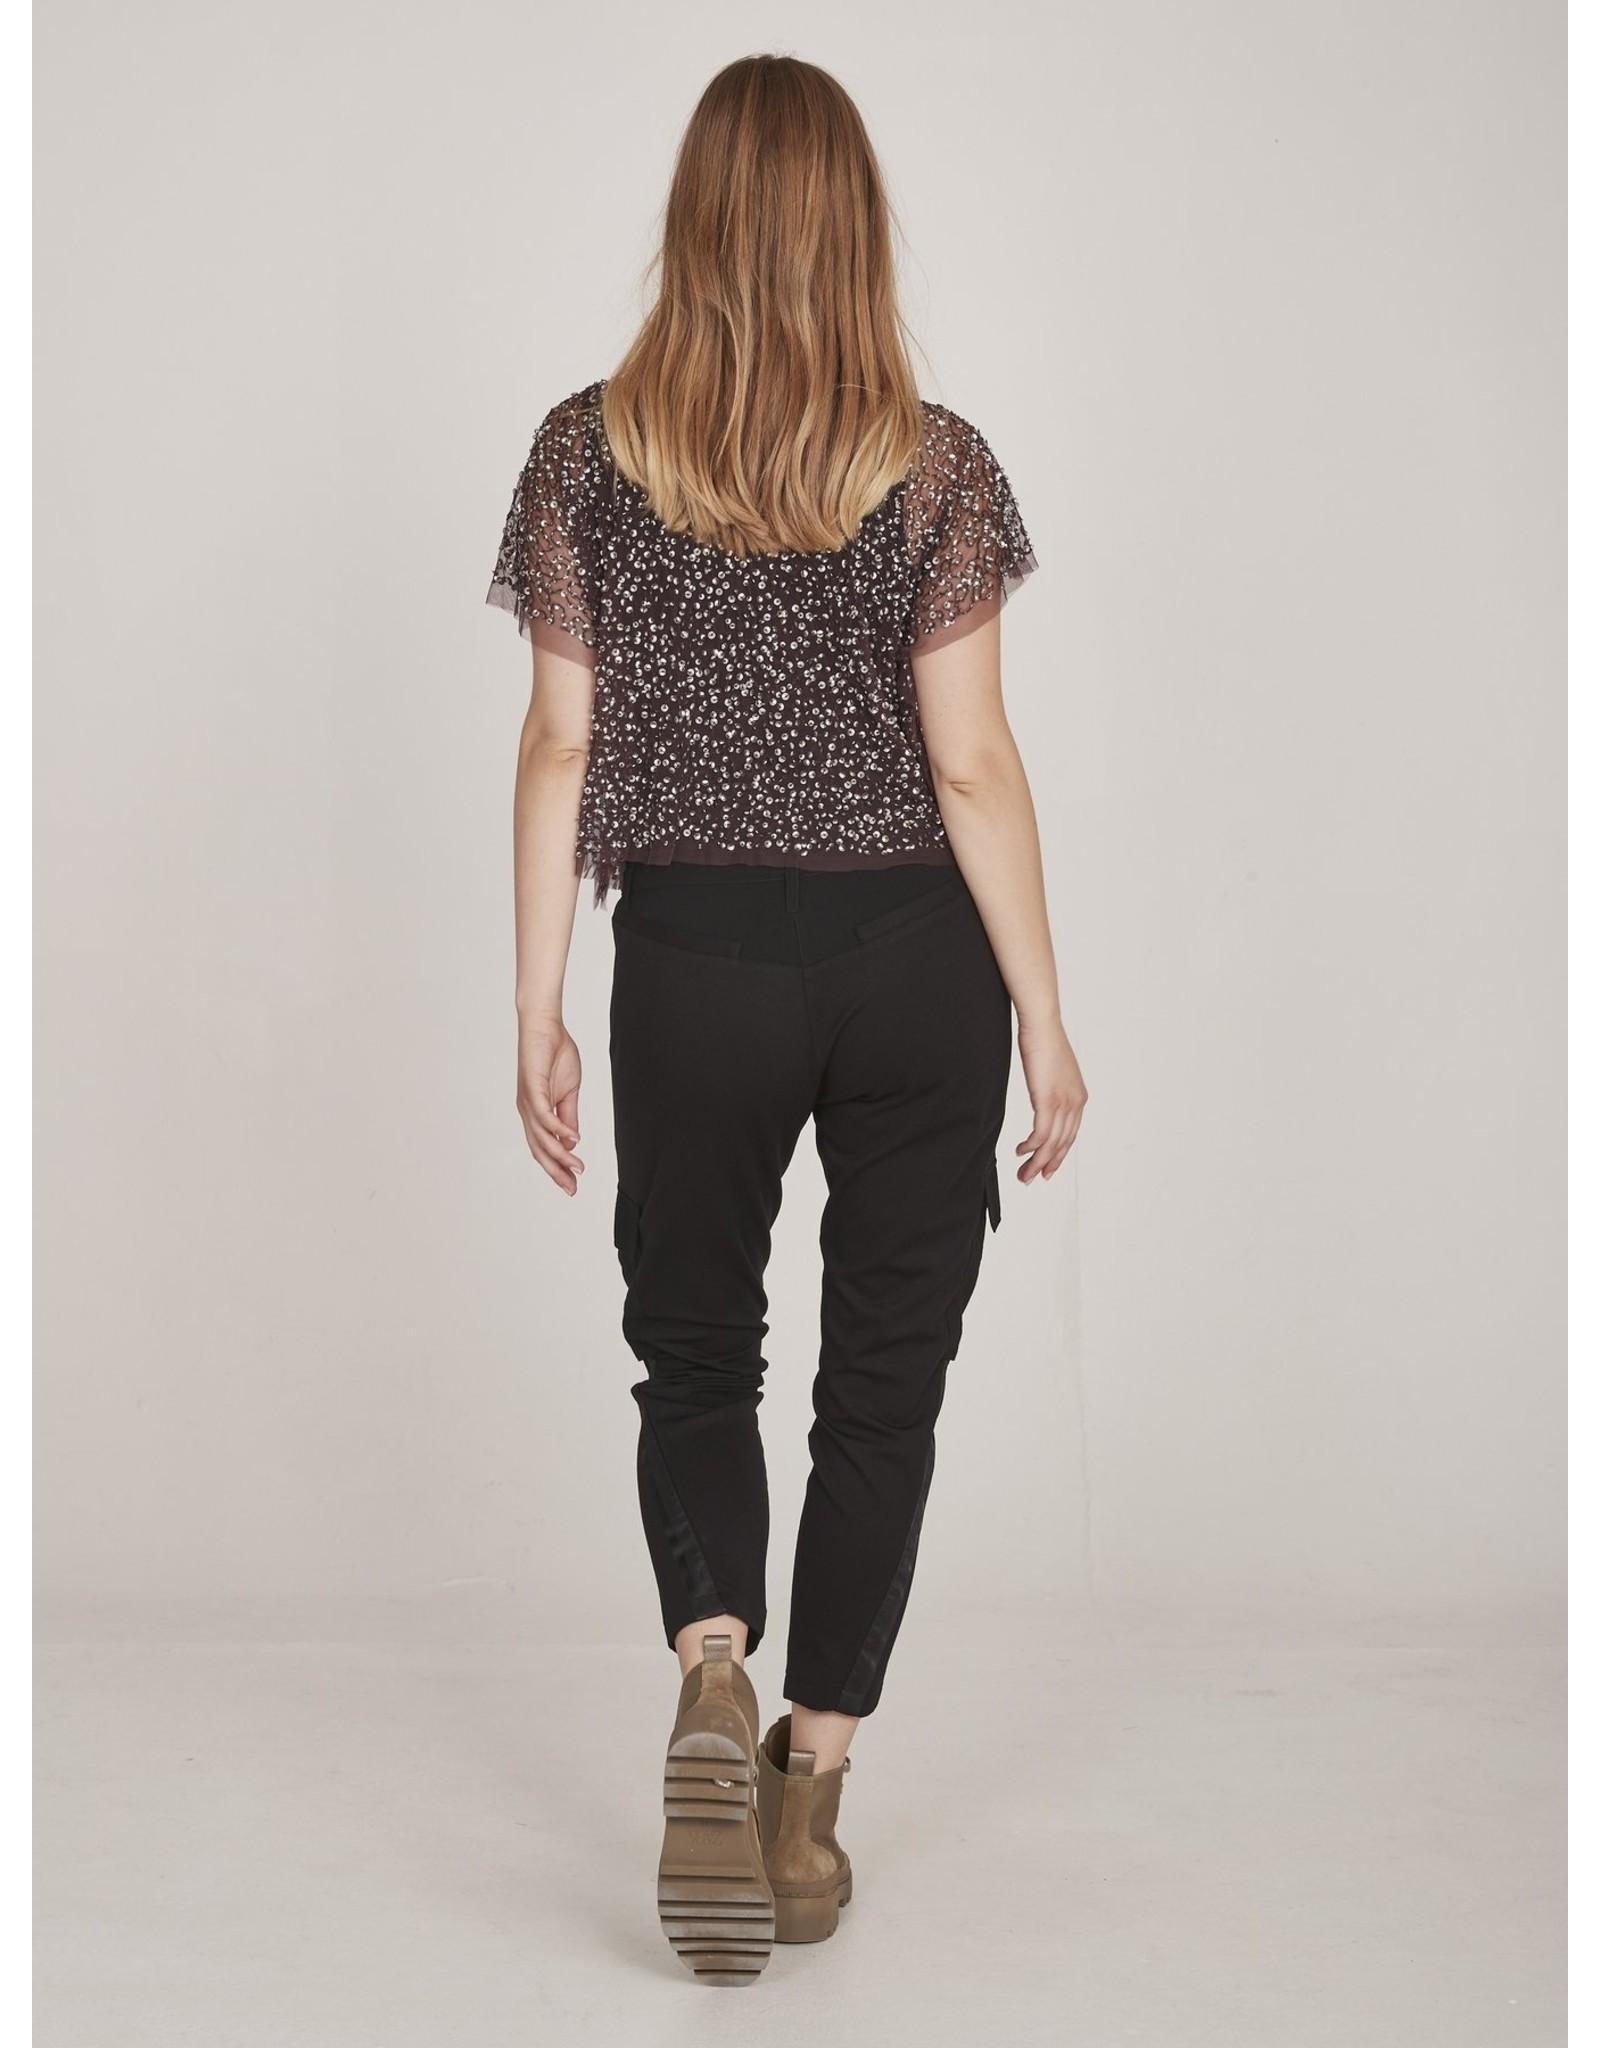 Nu Denmark Ea Baggy Black 7/8 Trousers